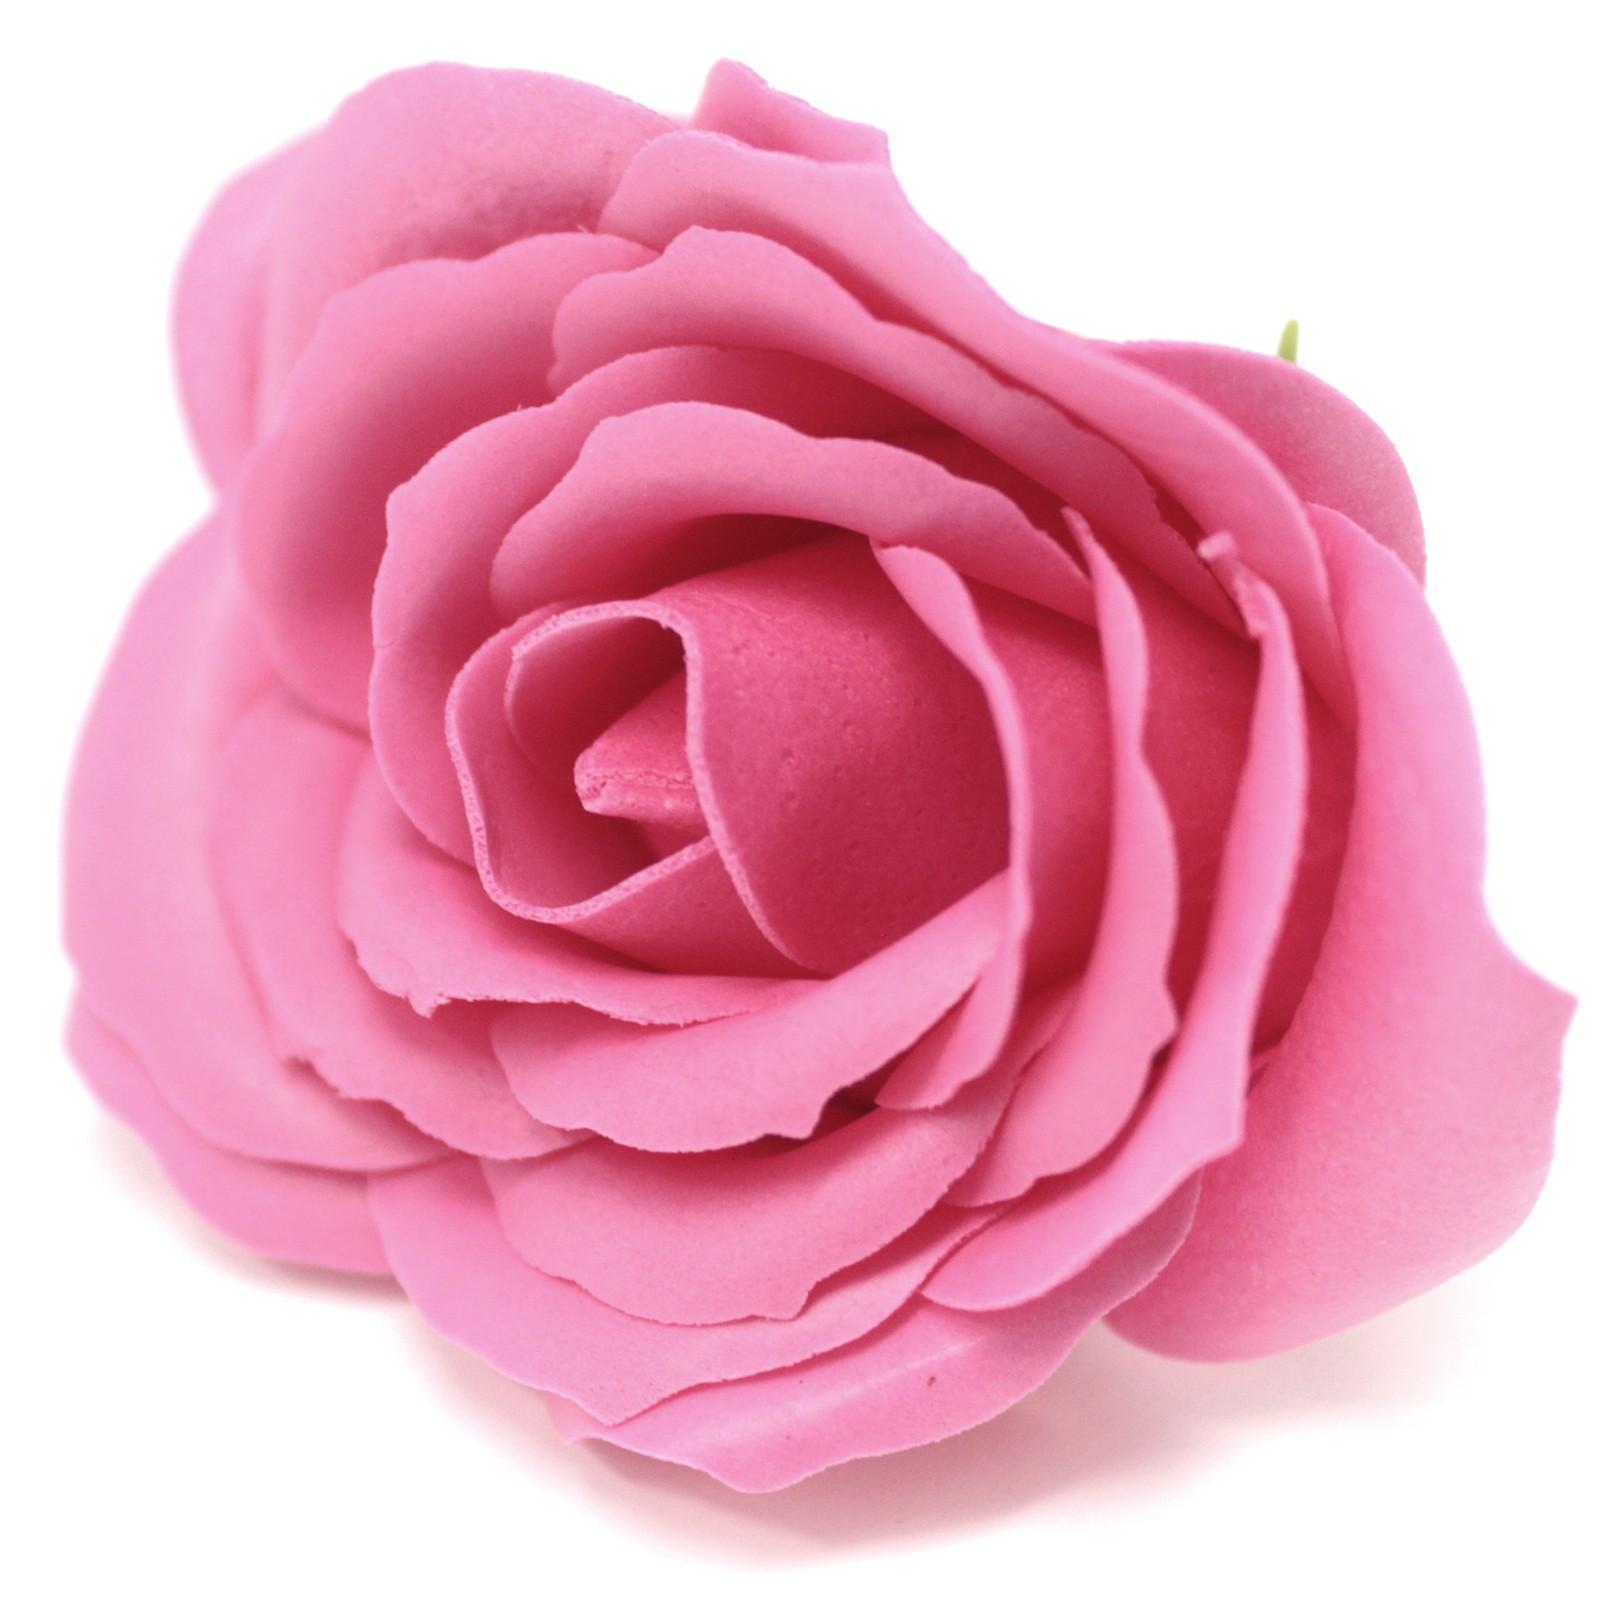 Craft Soap Flowers Lrg Rose Rose